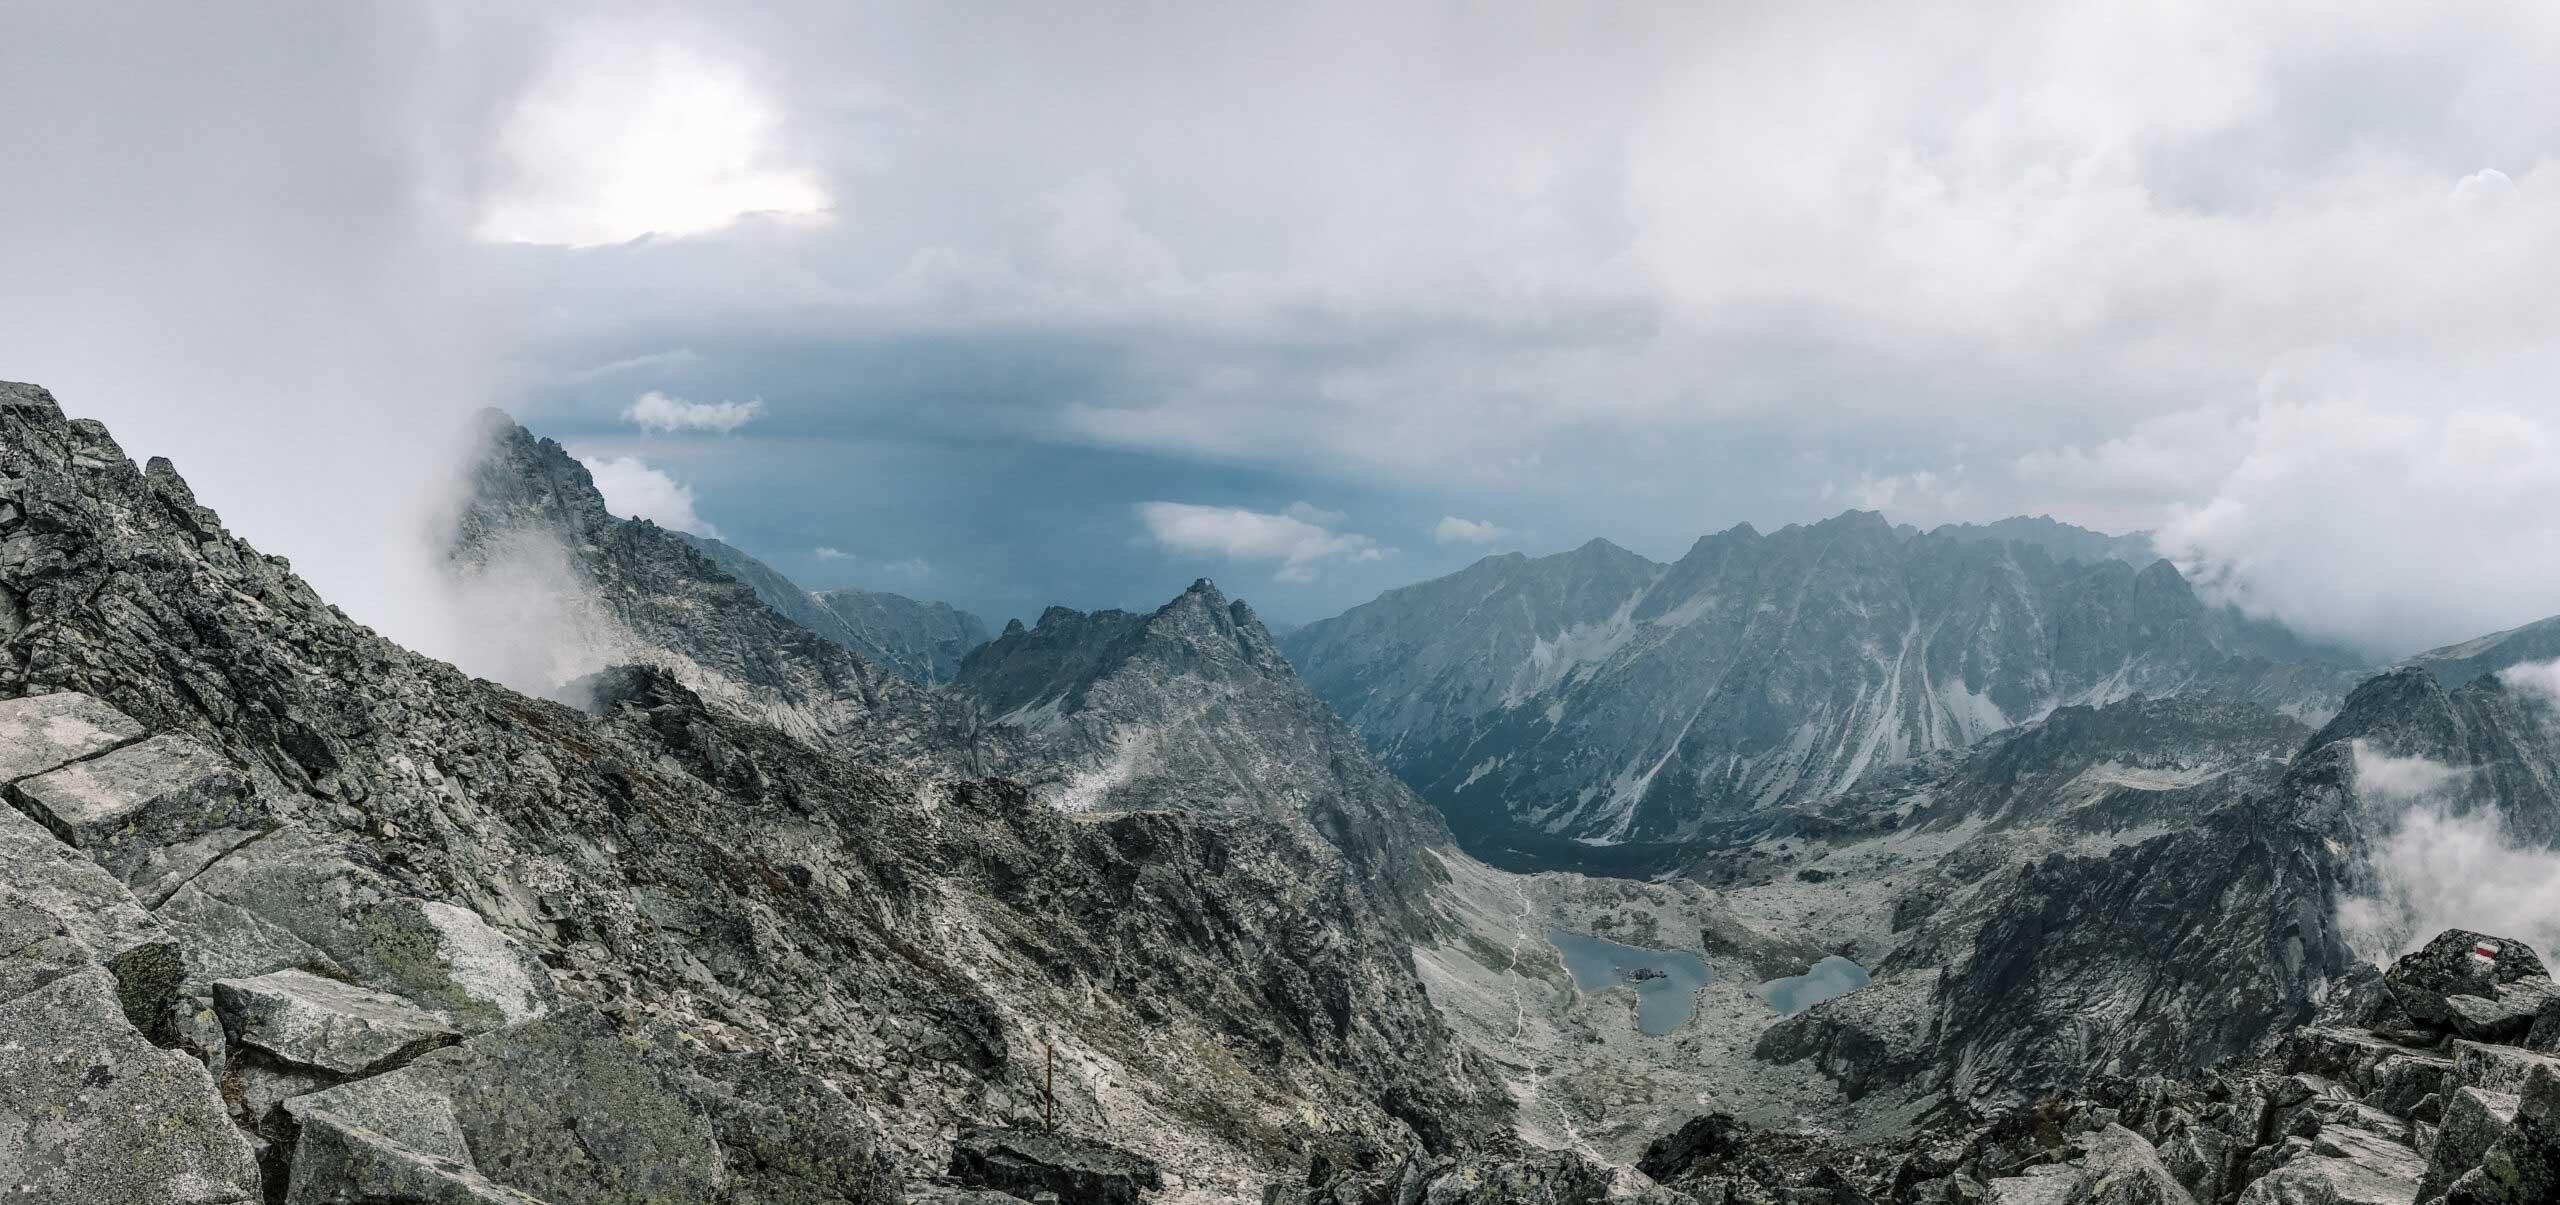 VYsoké Tatry, výstup na Rysy - Jiráci na cestách